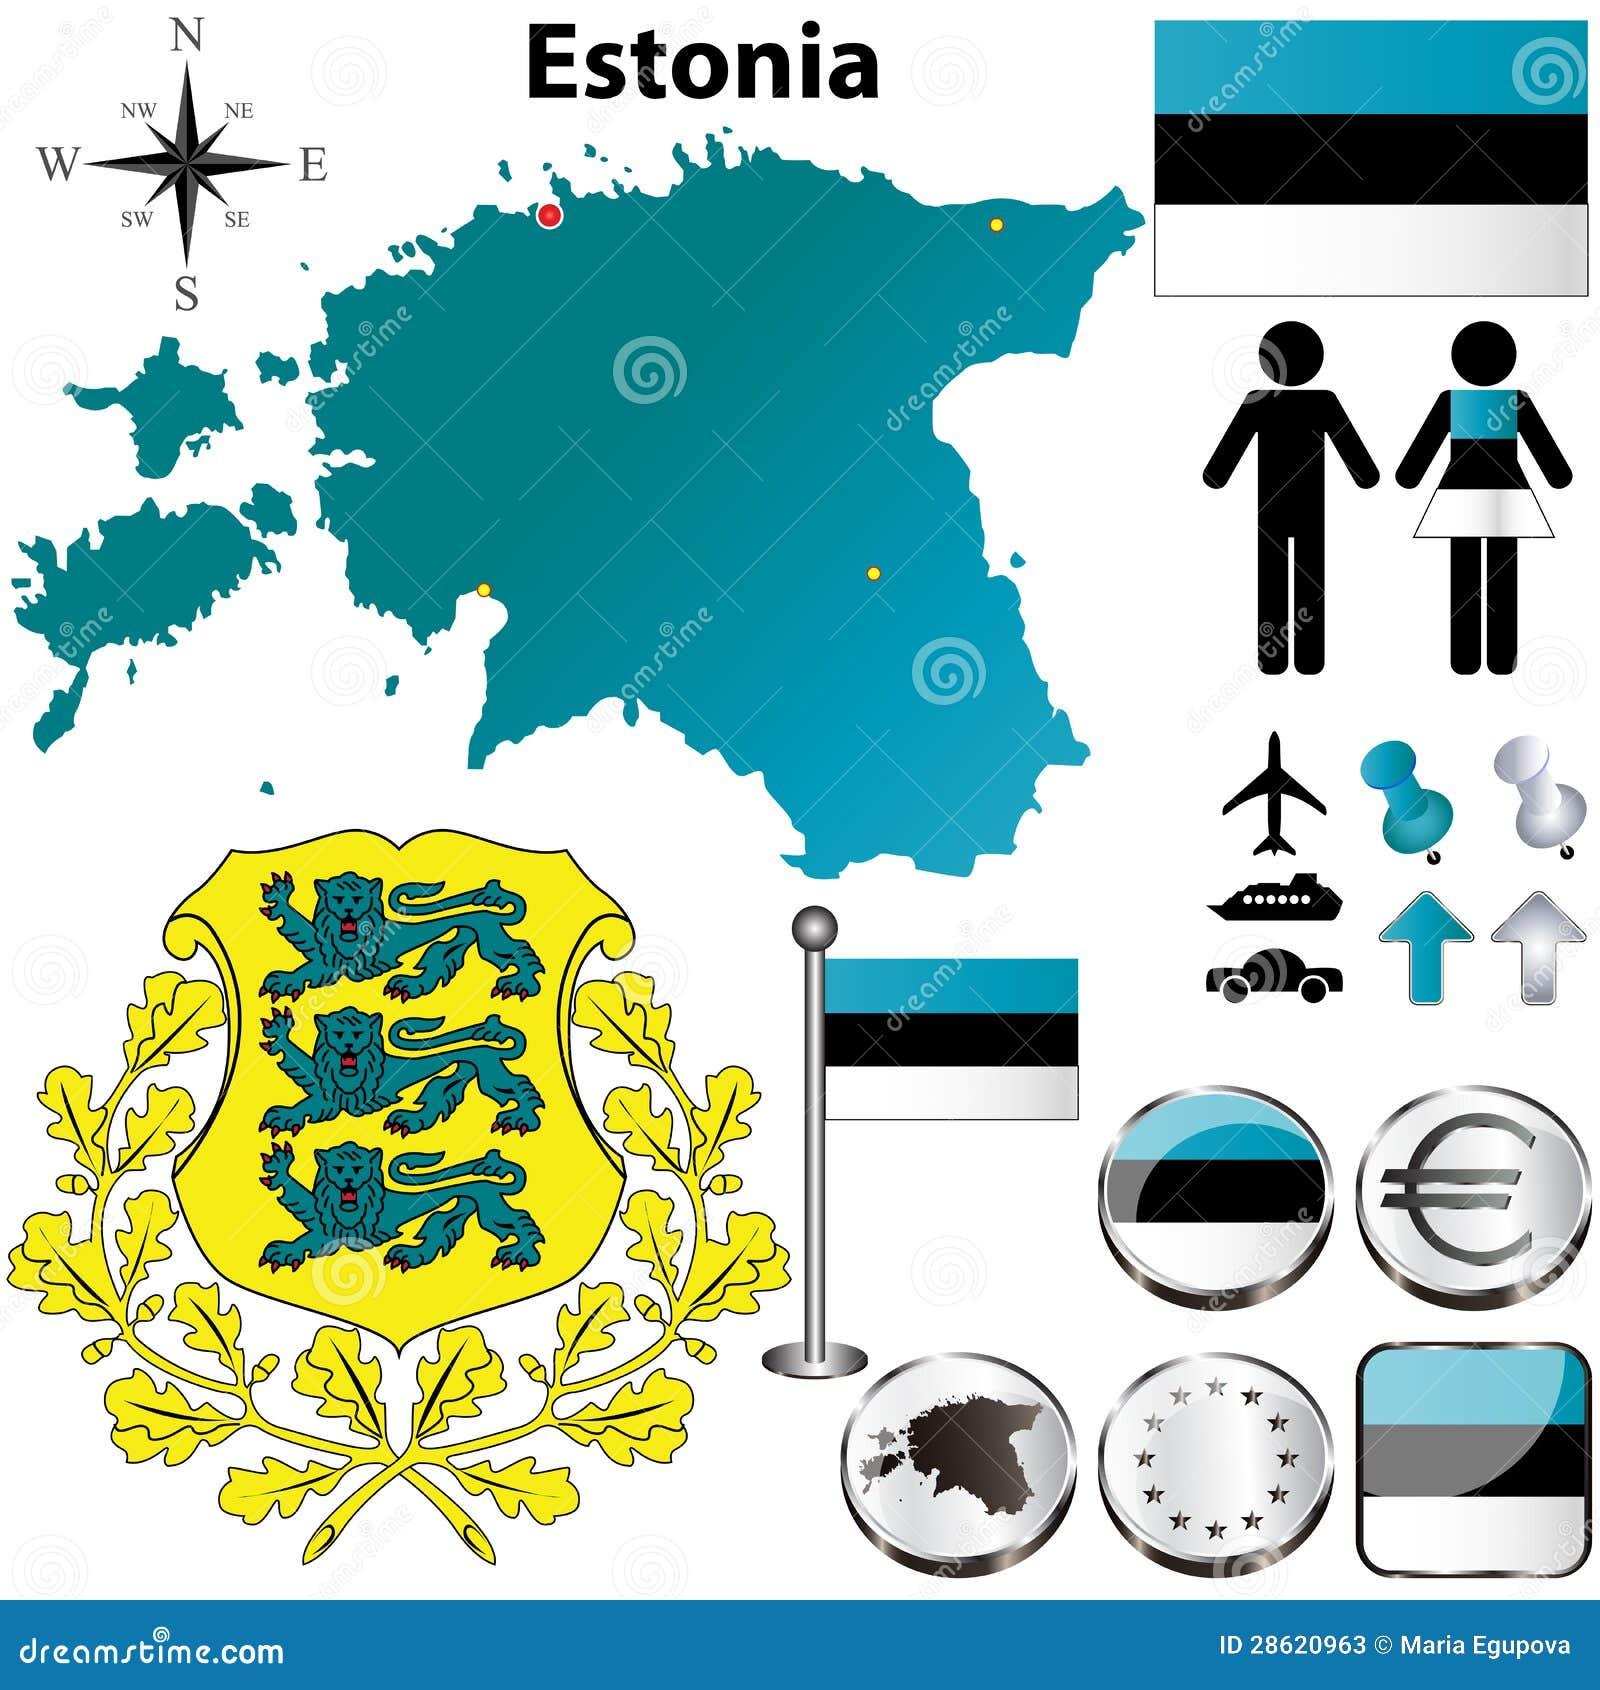 Estonia Map Stock Image Image Of Boundary Button Background - Estonia map download